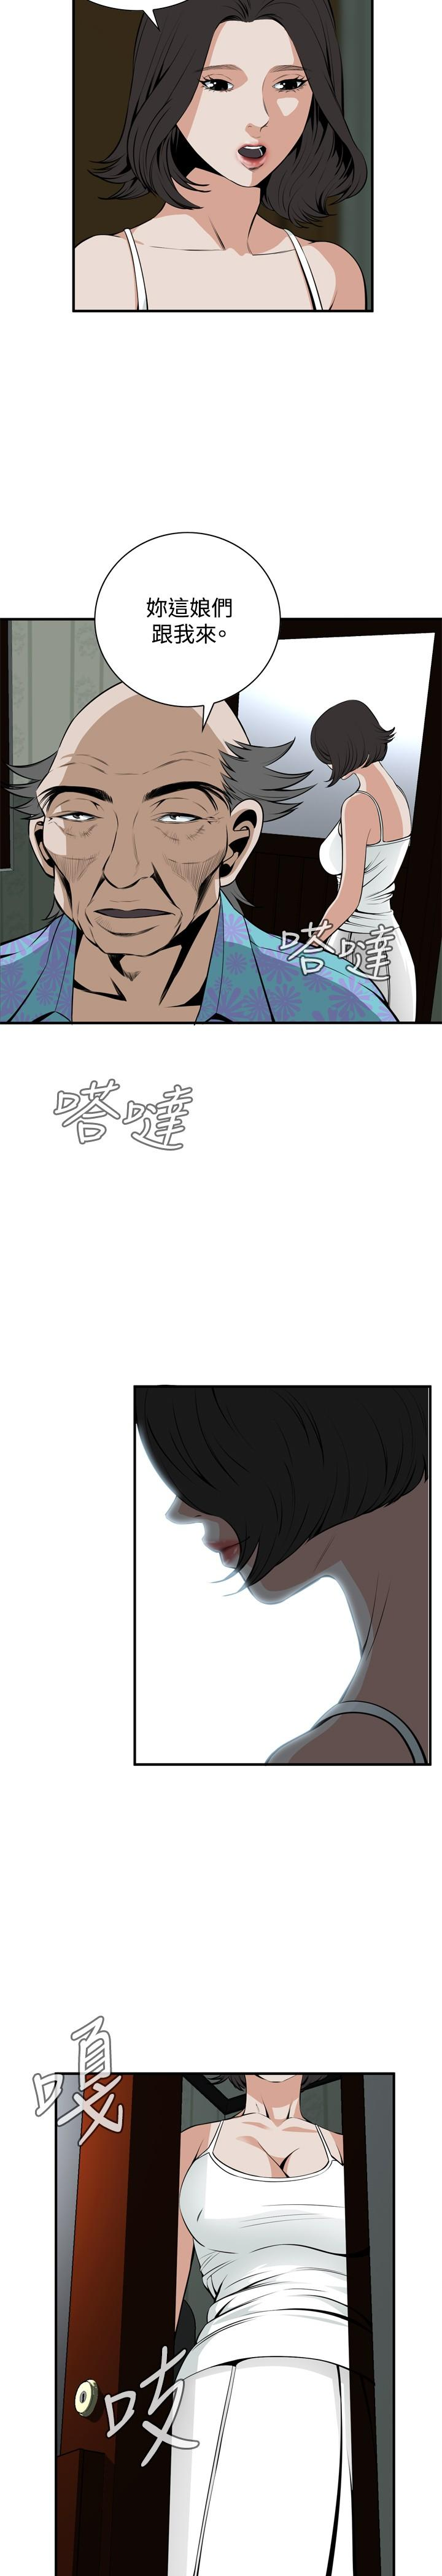 Take a Peek 偷窥 Ch.39~51 [Chinese]中文 114